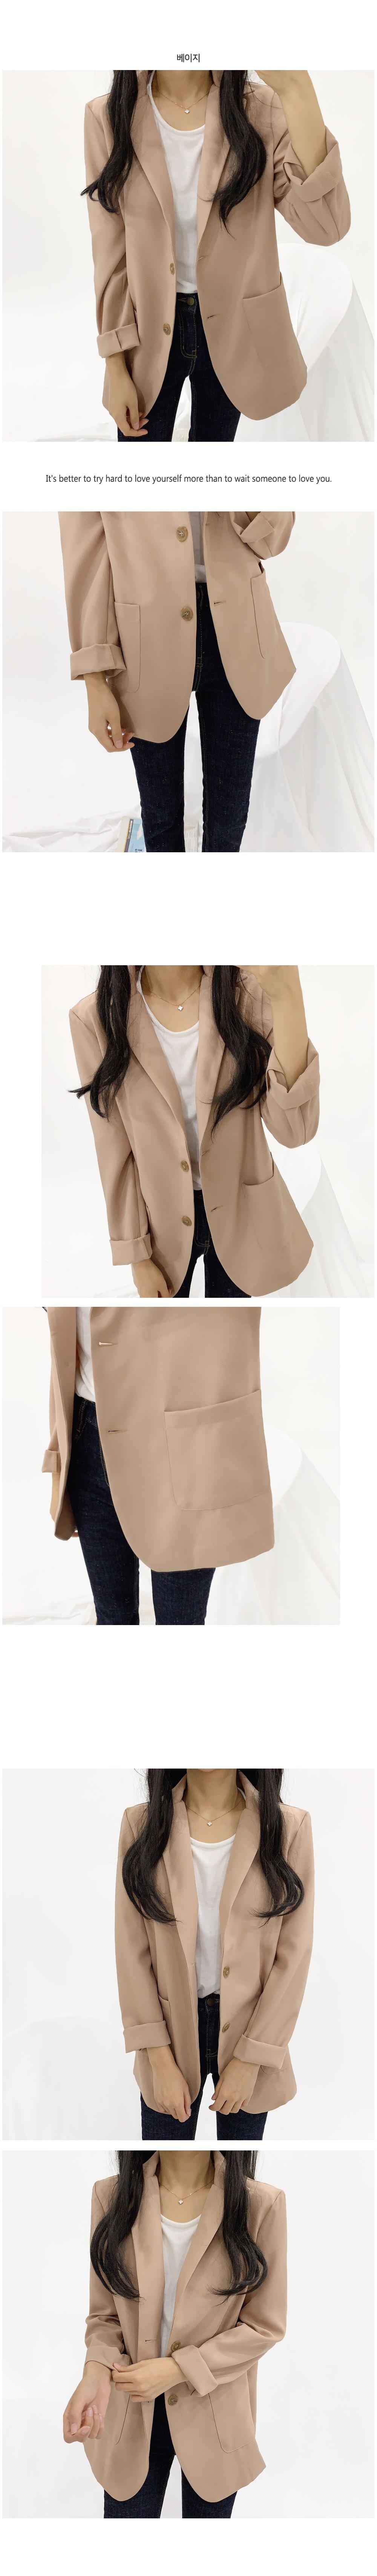 Round hem basic jacket O#YW305